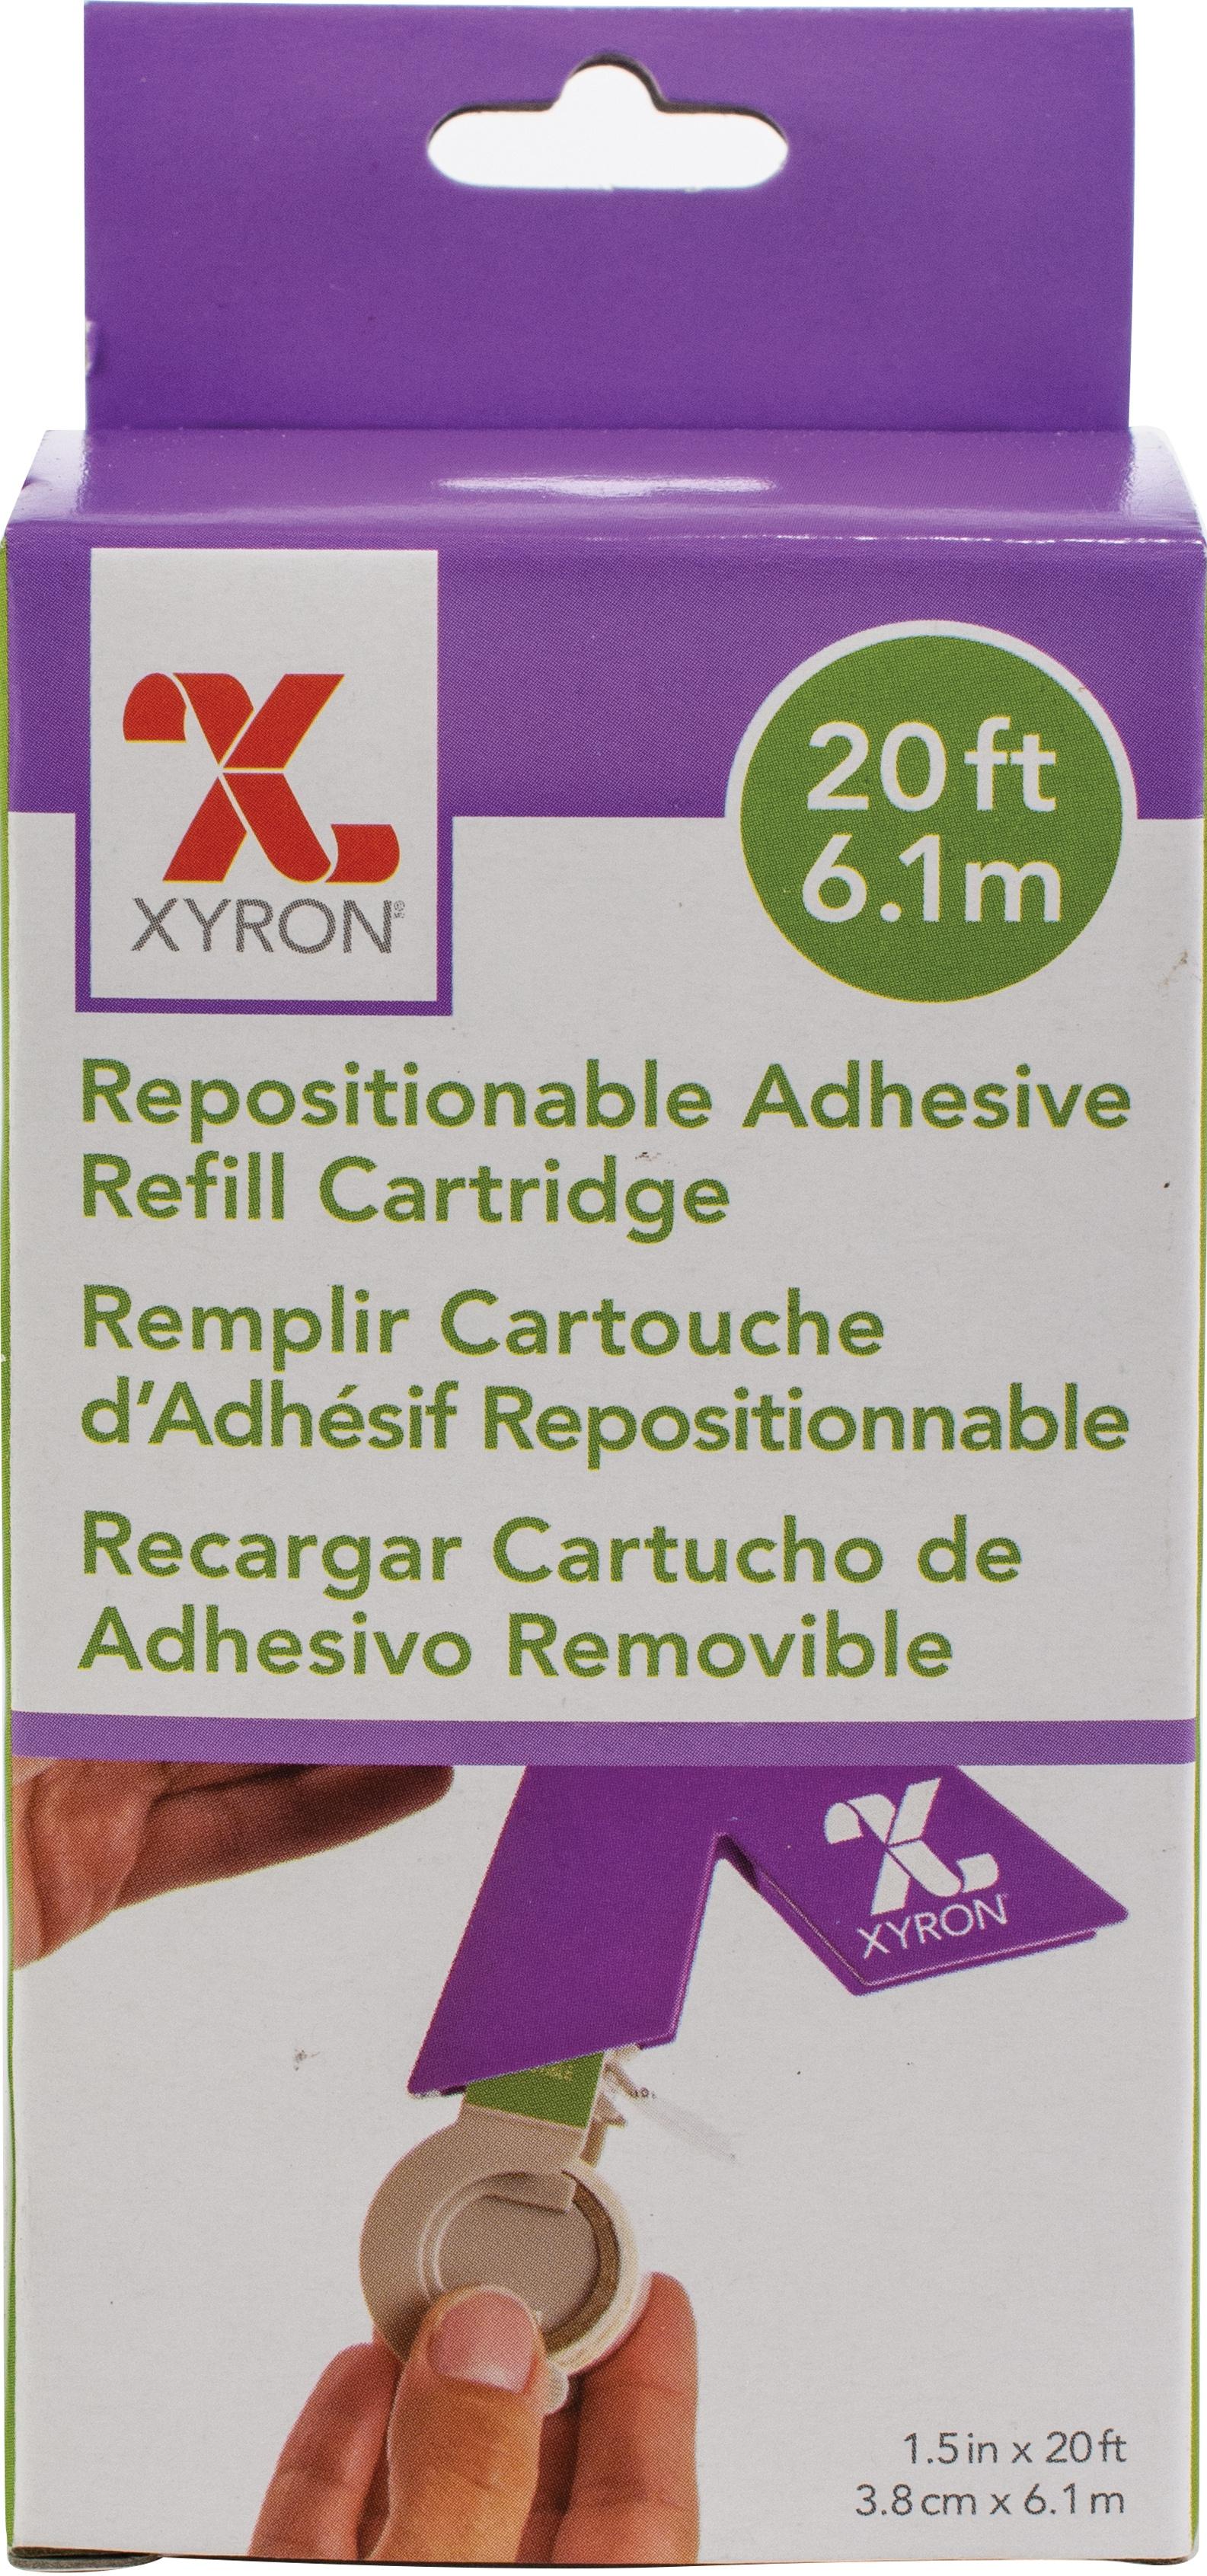 XYRON-REPO ADHV 150 (20') REFL